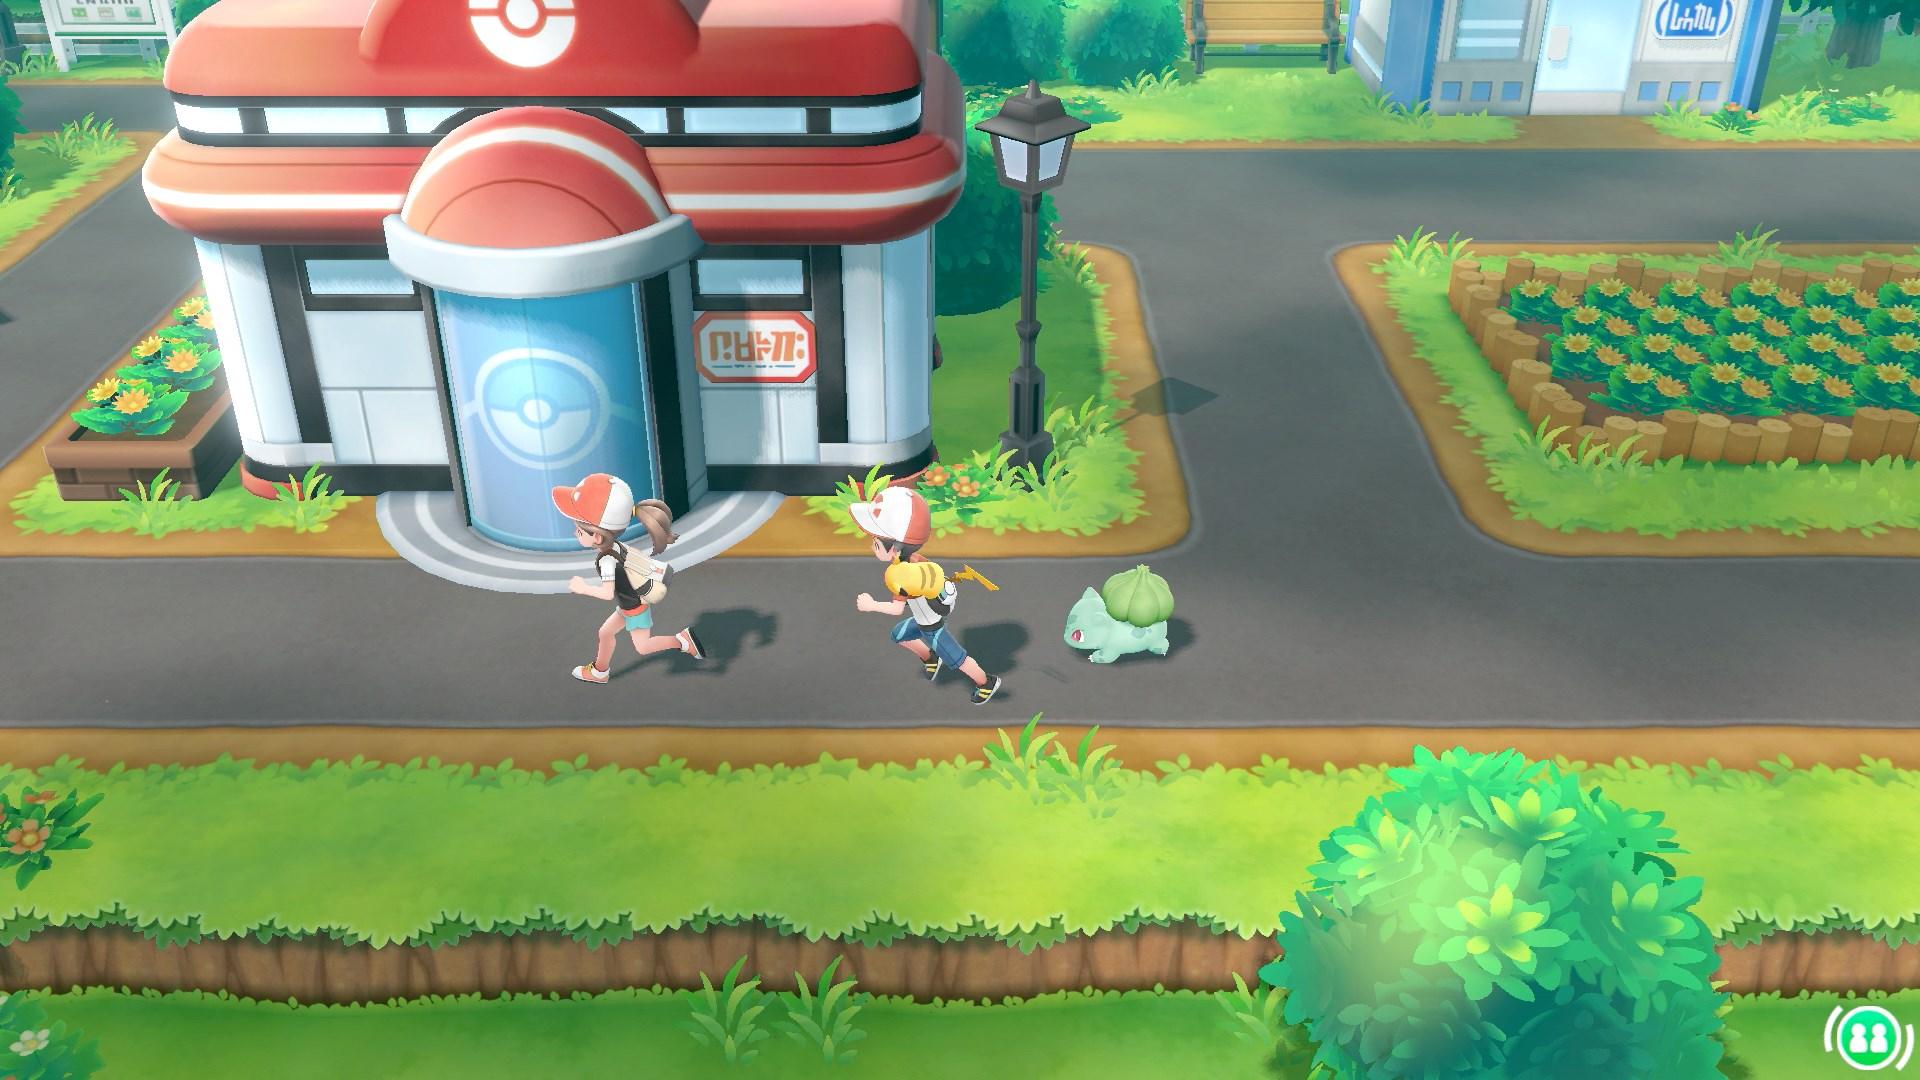 Pokemon Lets Go Screenshot 07 2 png jpgcopy - How To Get Eevee On Your Shoulder Let S Go